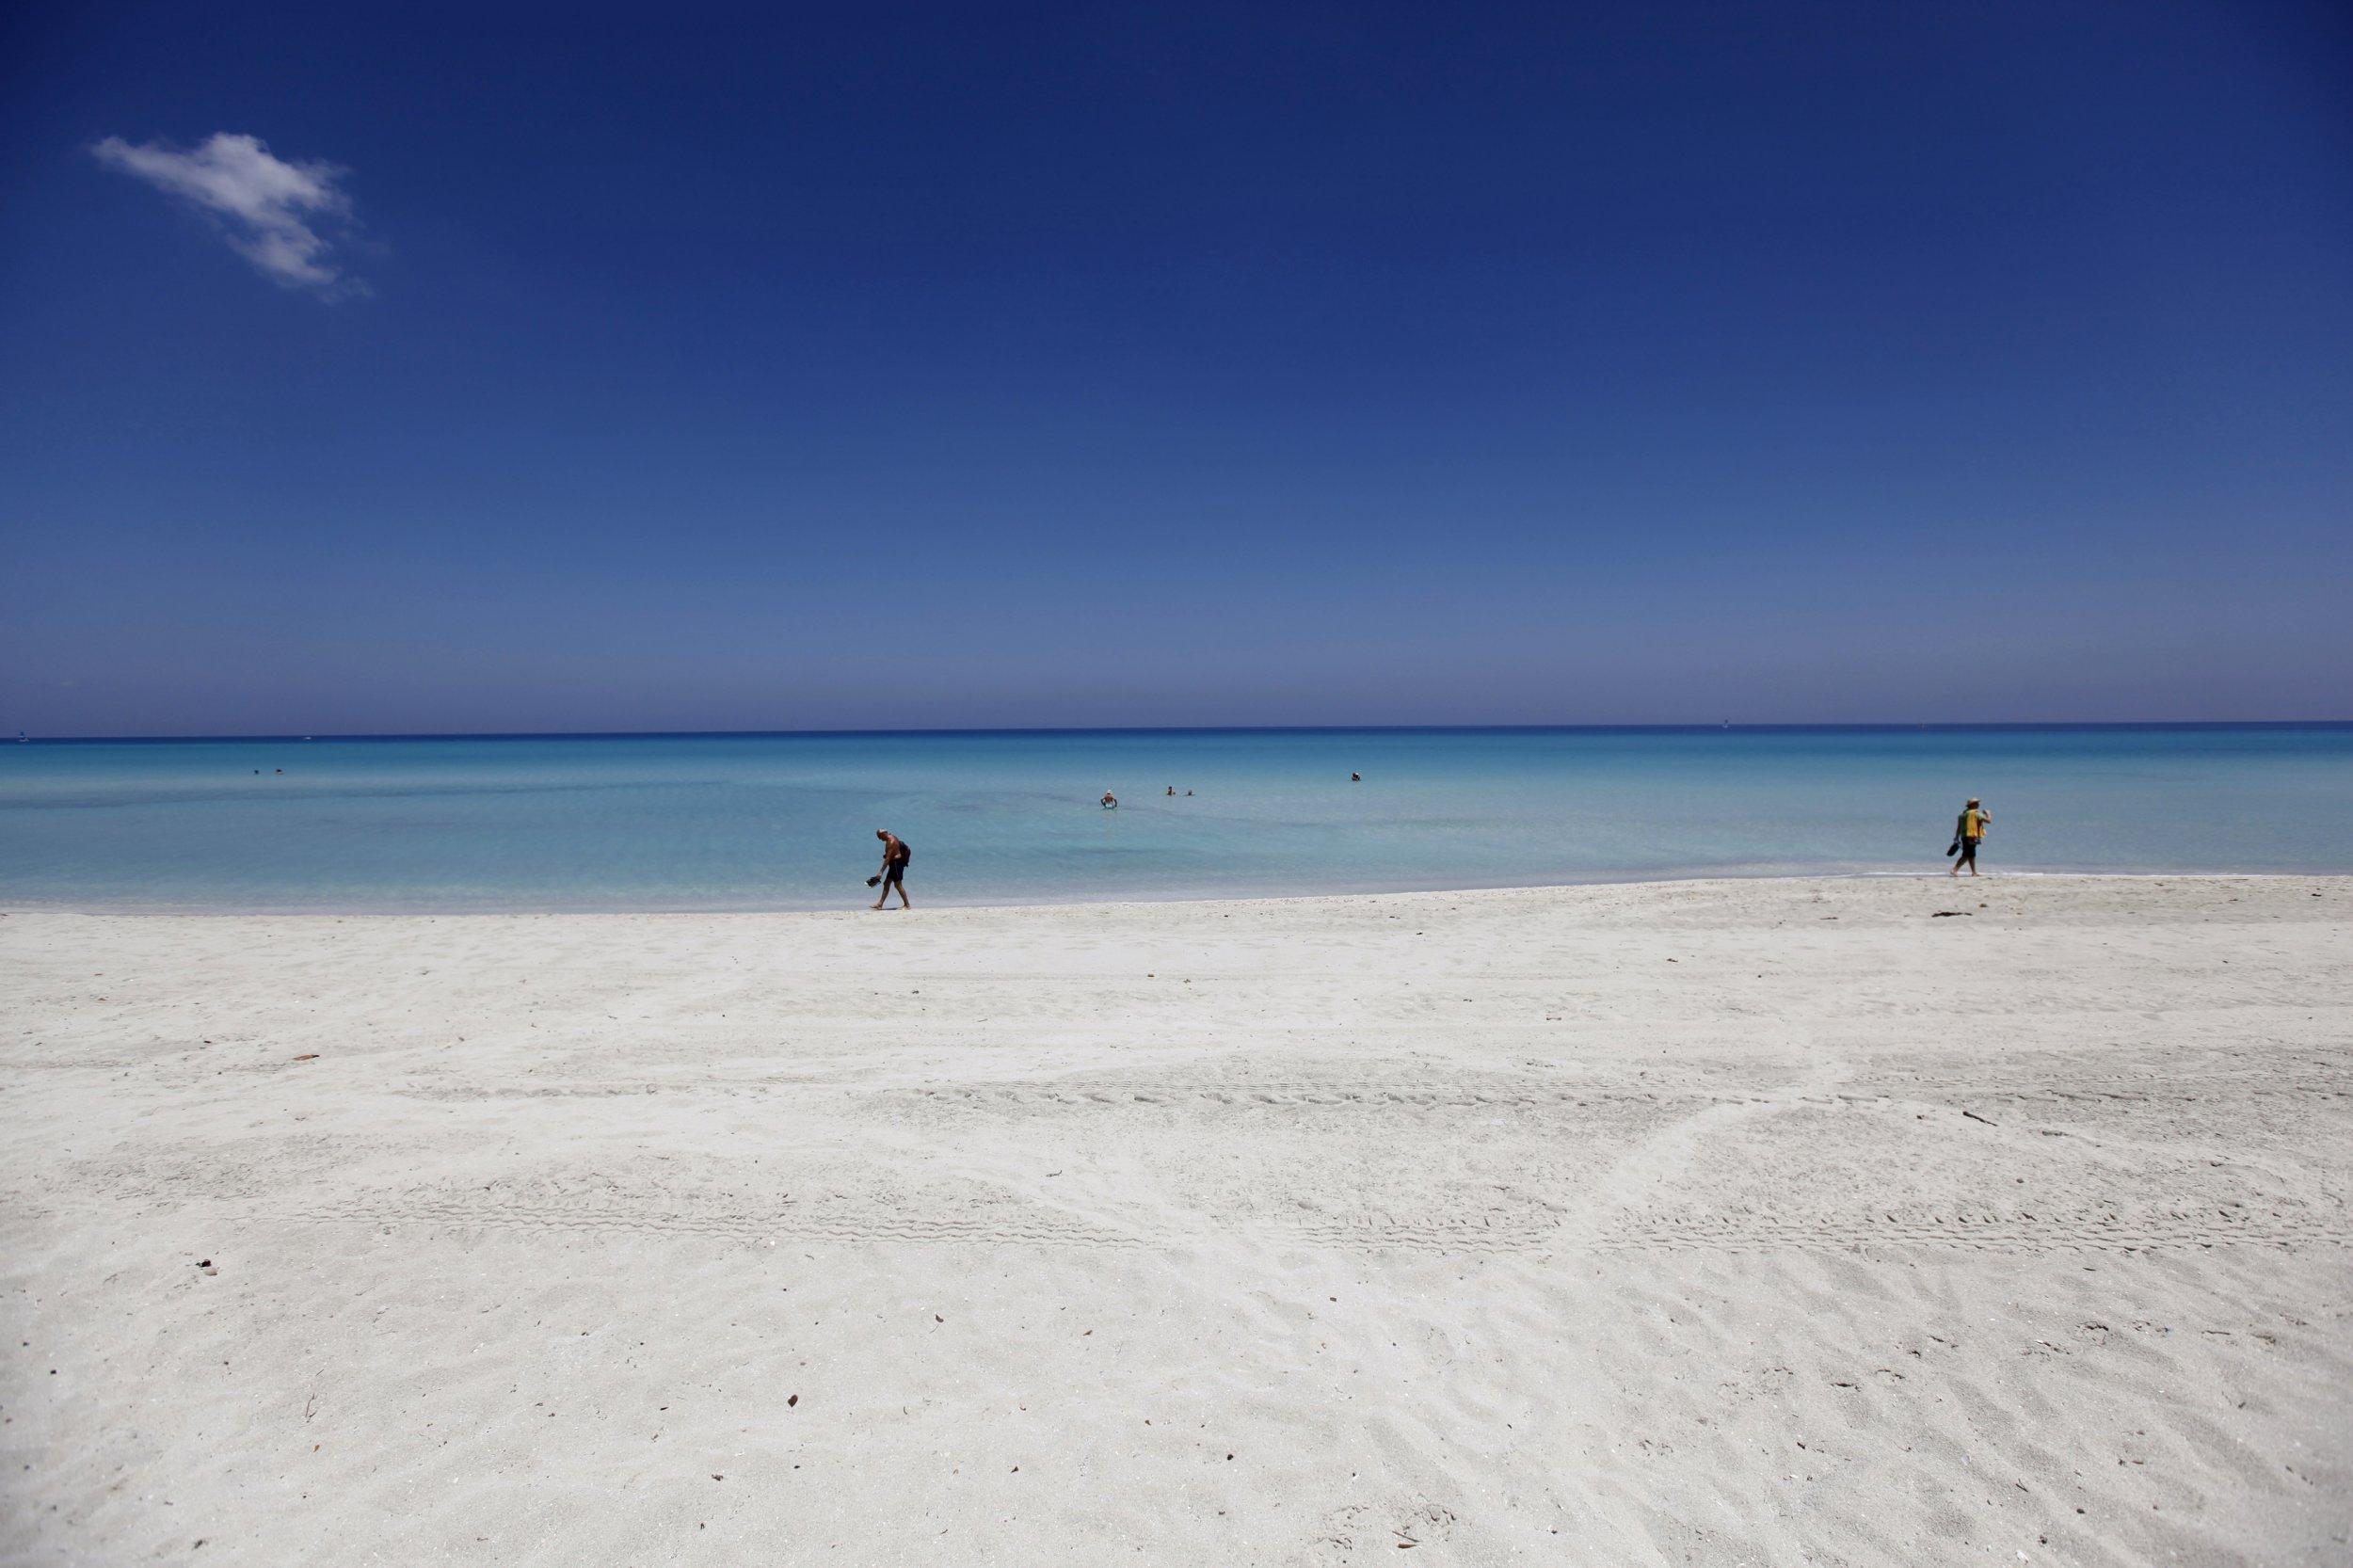 9/7 White Beaches Fish Poop